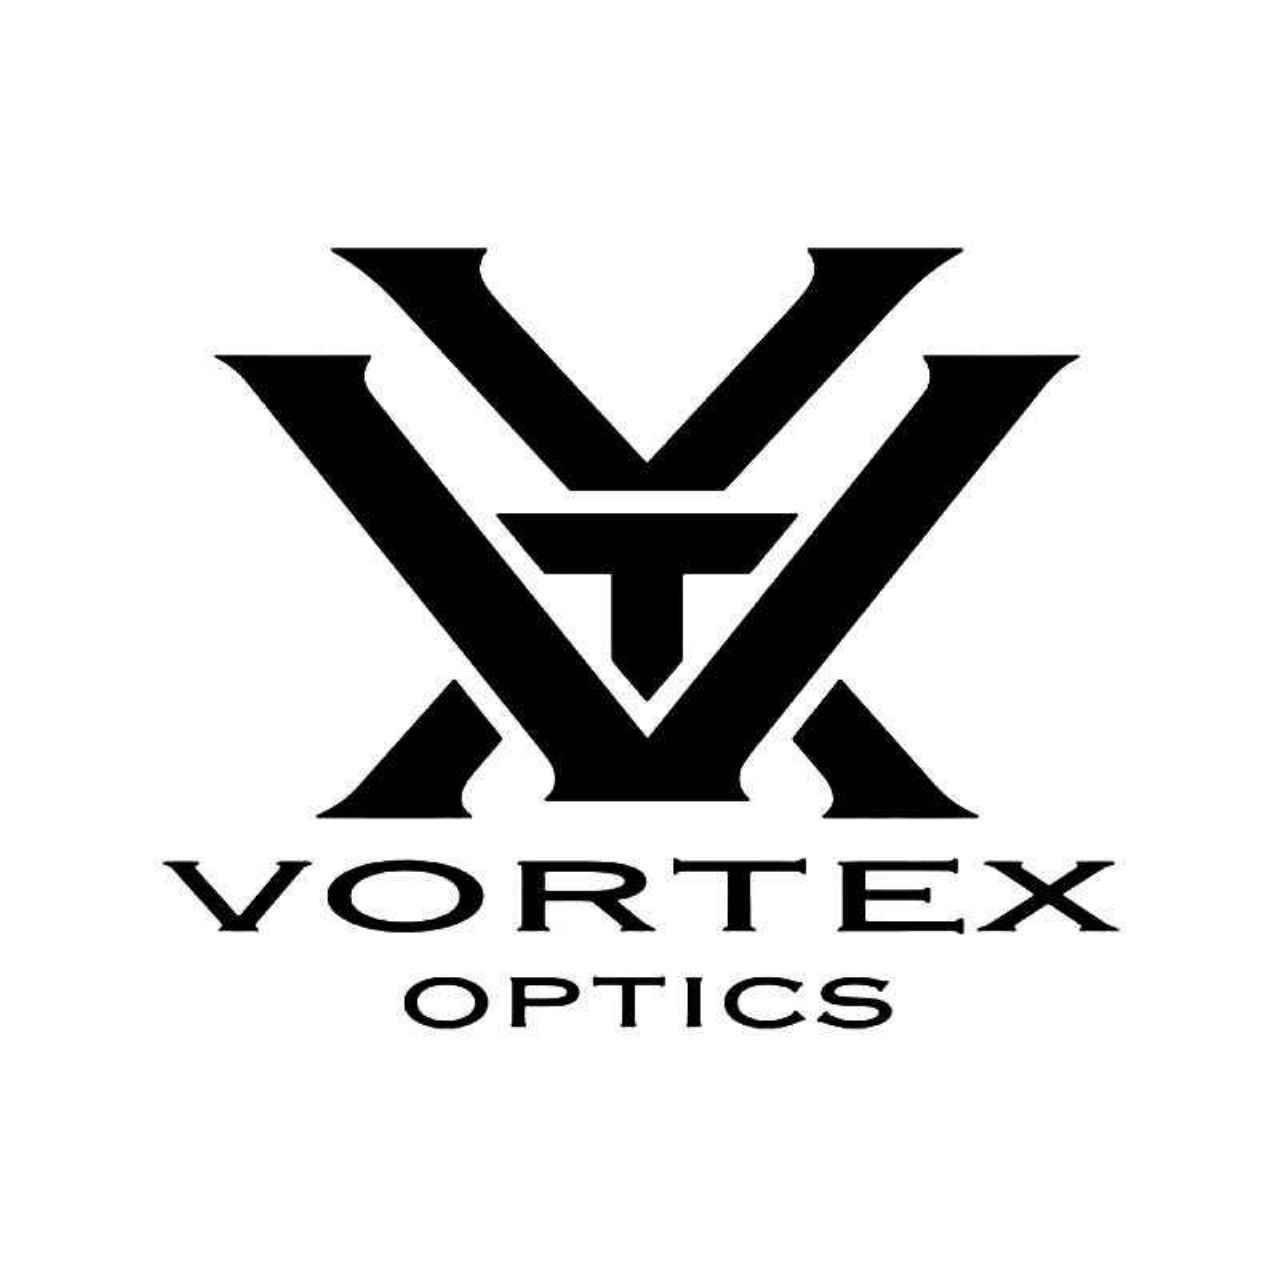 Vortex Optics Vinyl Decal Sticker Ballzbeatz Com